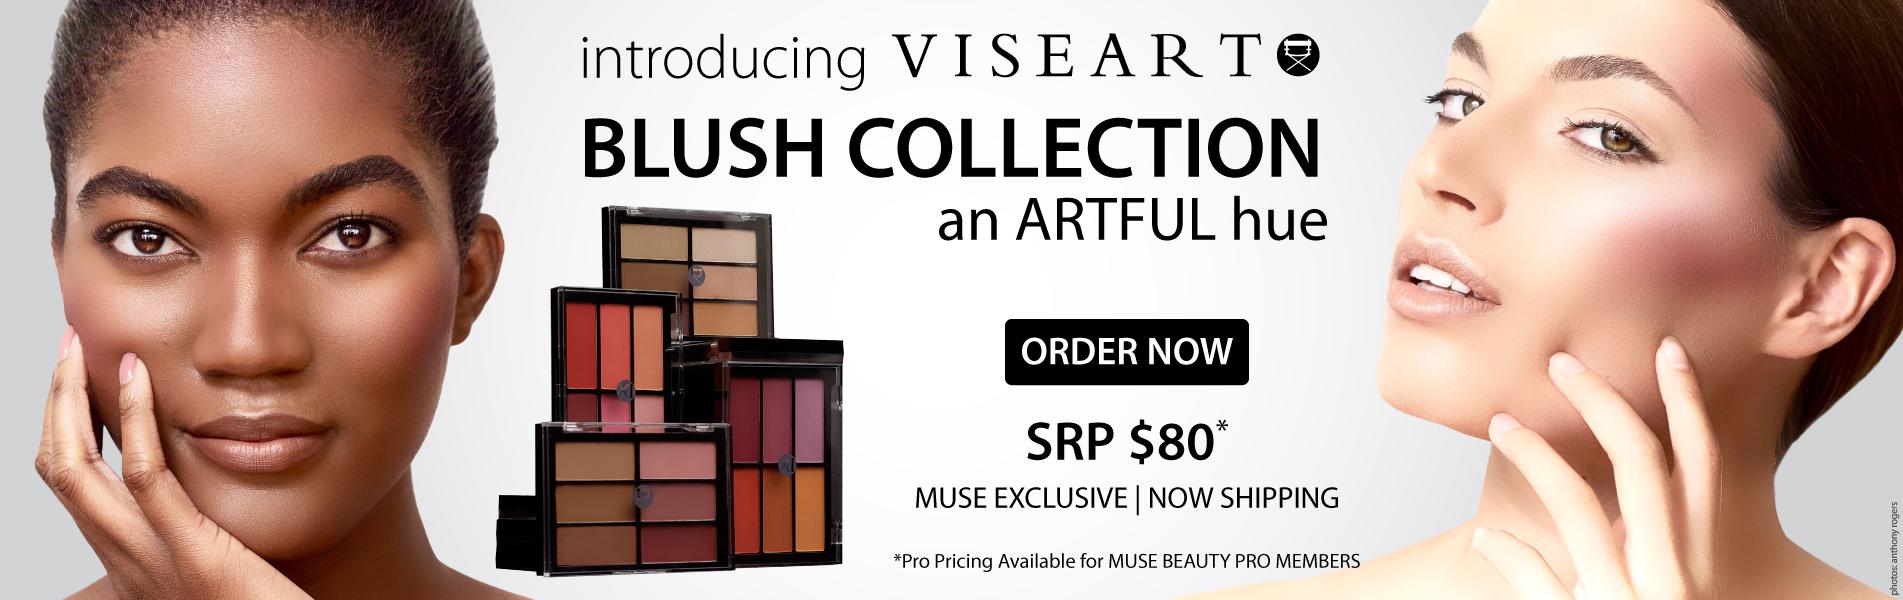 Viseart Blush Palette Collection